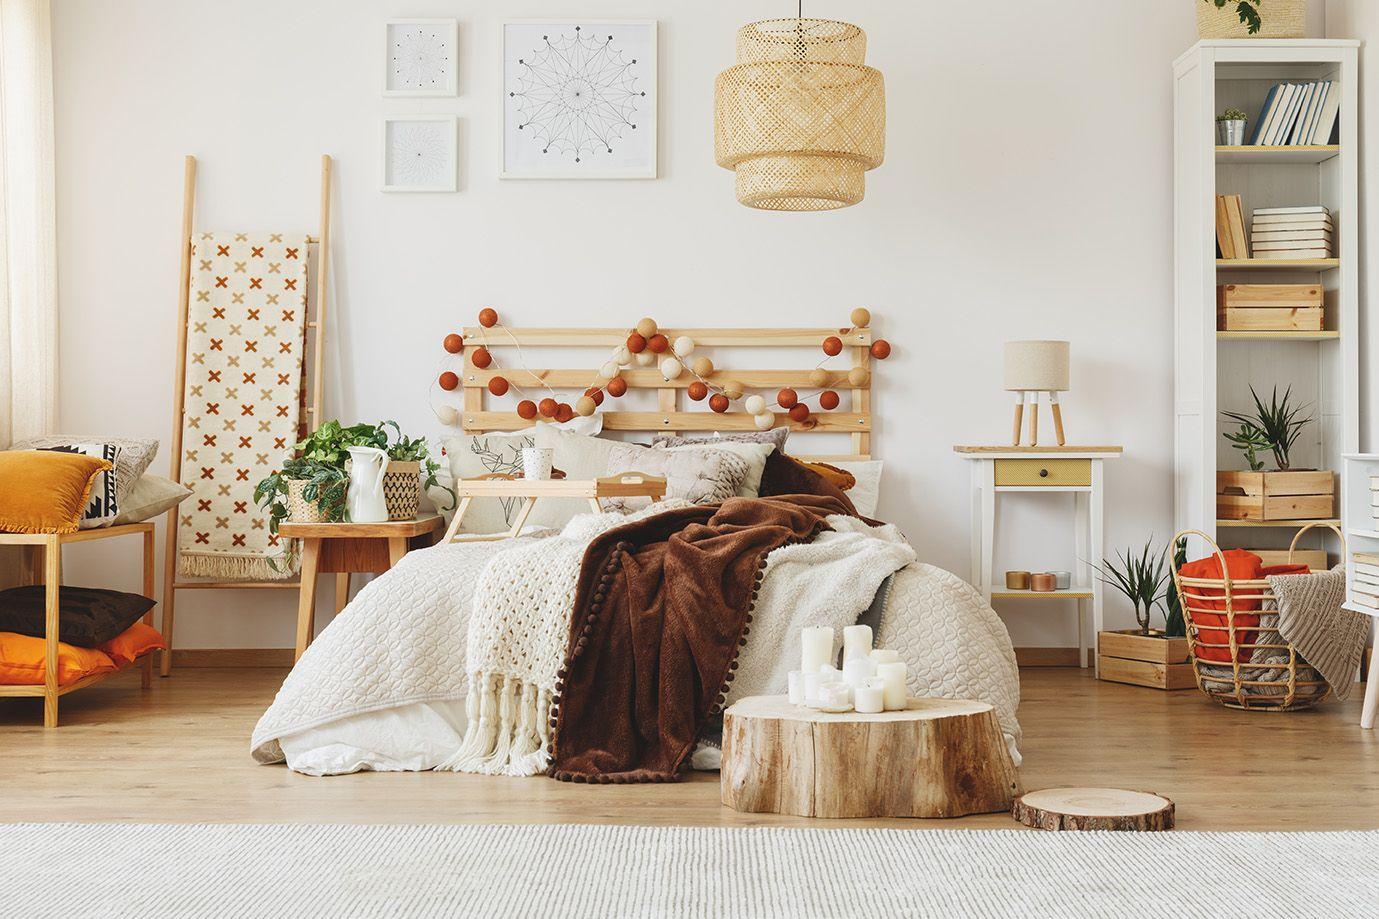 C mo decorar tu hogar en invierno puerto capital for Como decorar tu hogar